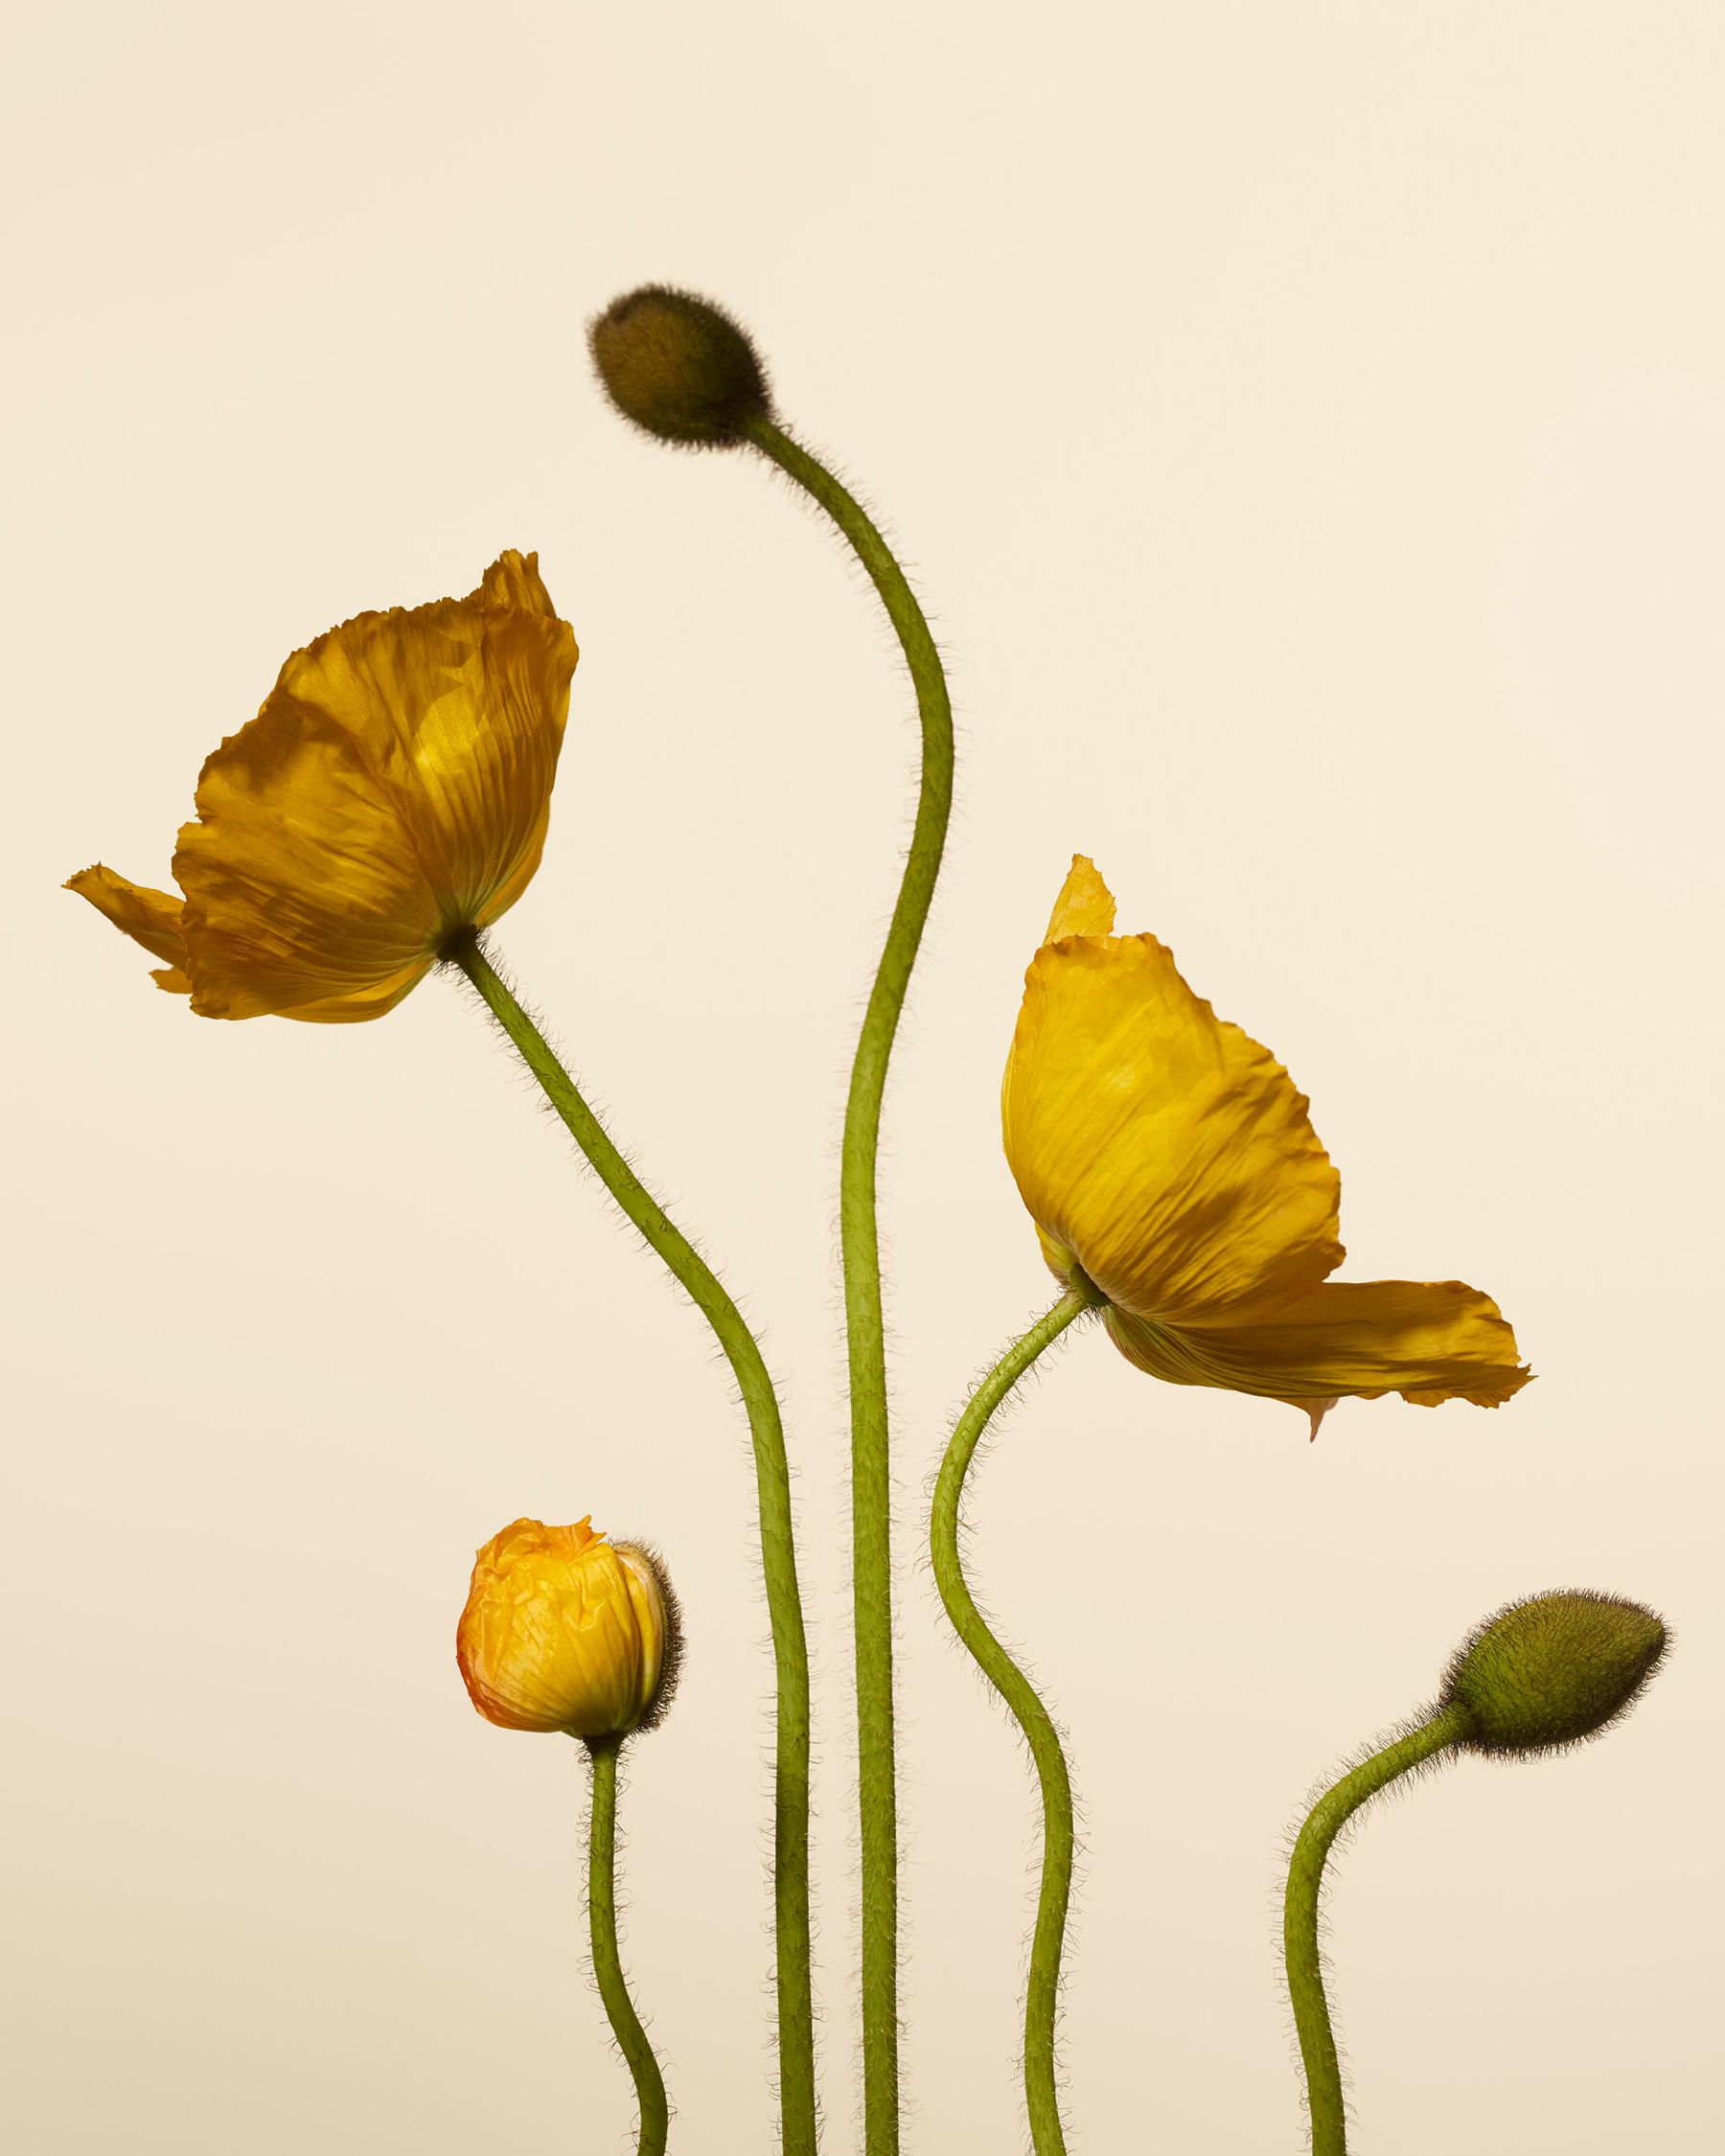 Poppies_4x5.jpg